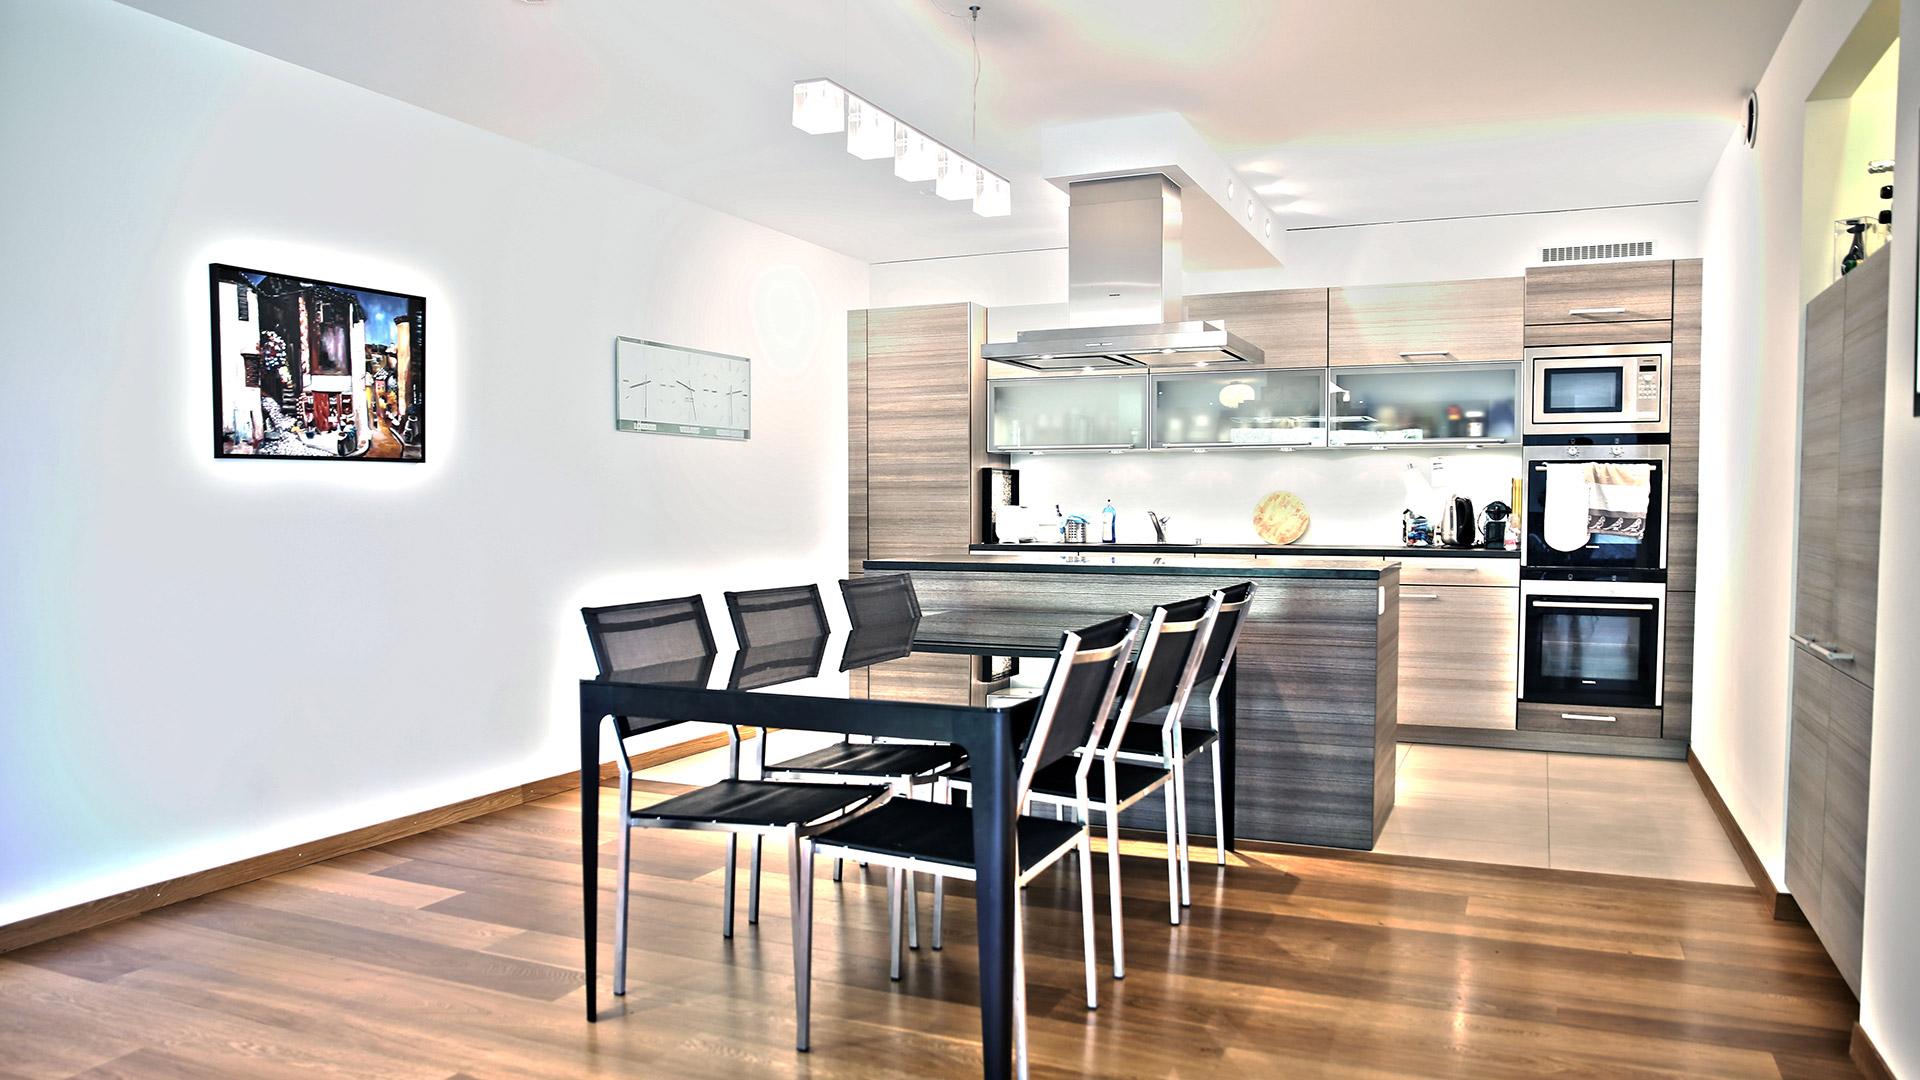 Chalet La Perle 1 Apartments, Switzerland